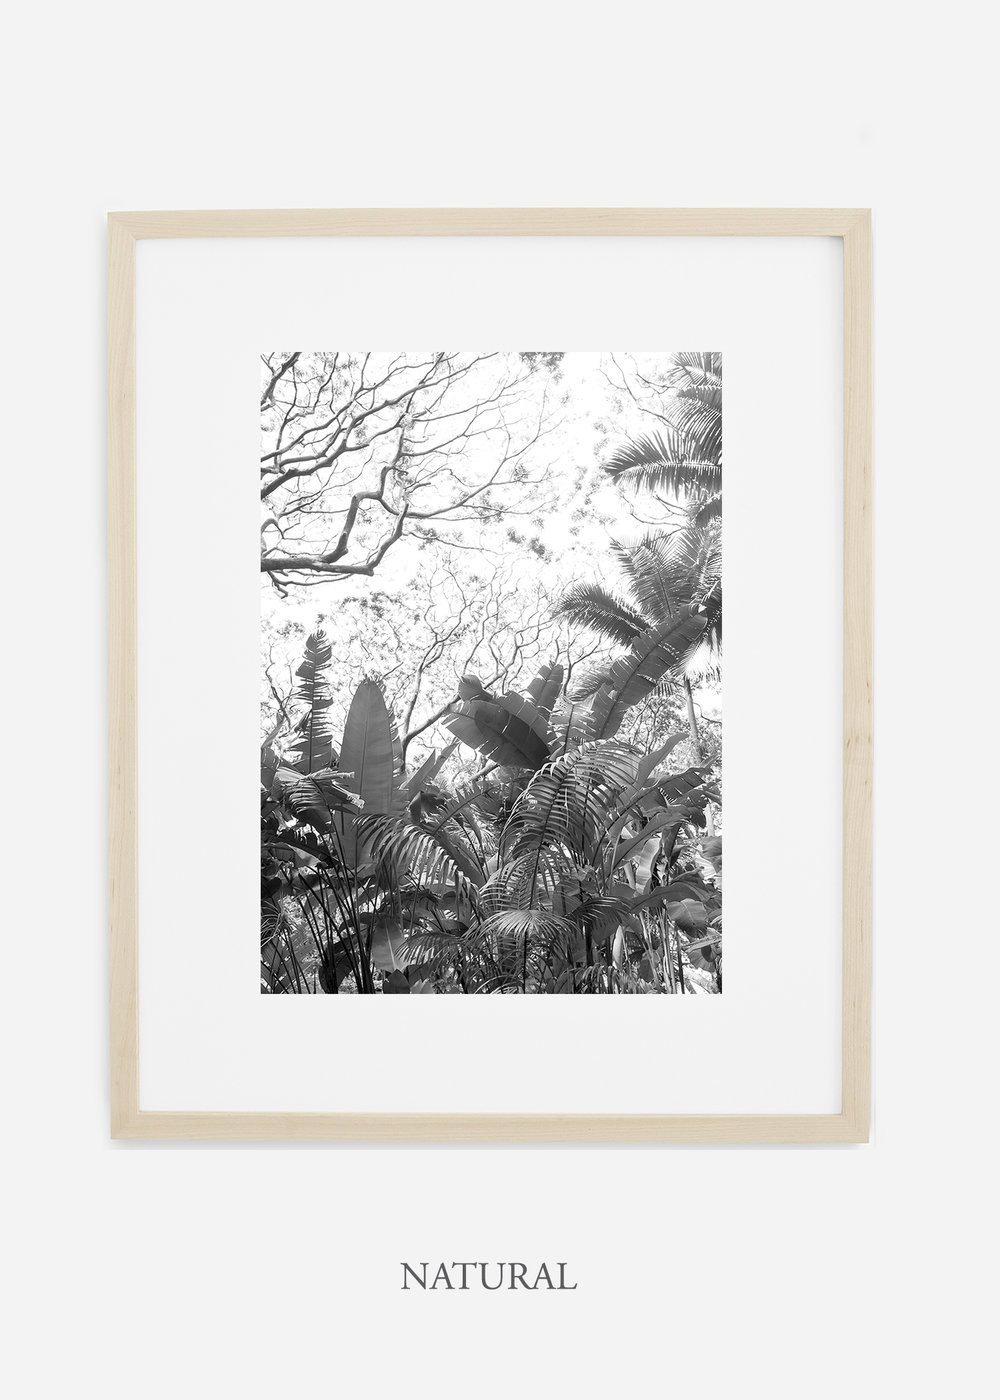 tropicaldecor_WilderCalifornia_TropicalRainforest2_Art_Photography_interiordesign_naturalframe.jpg